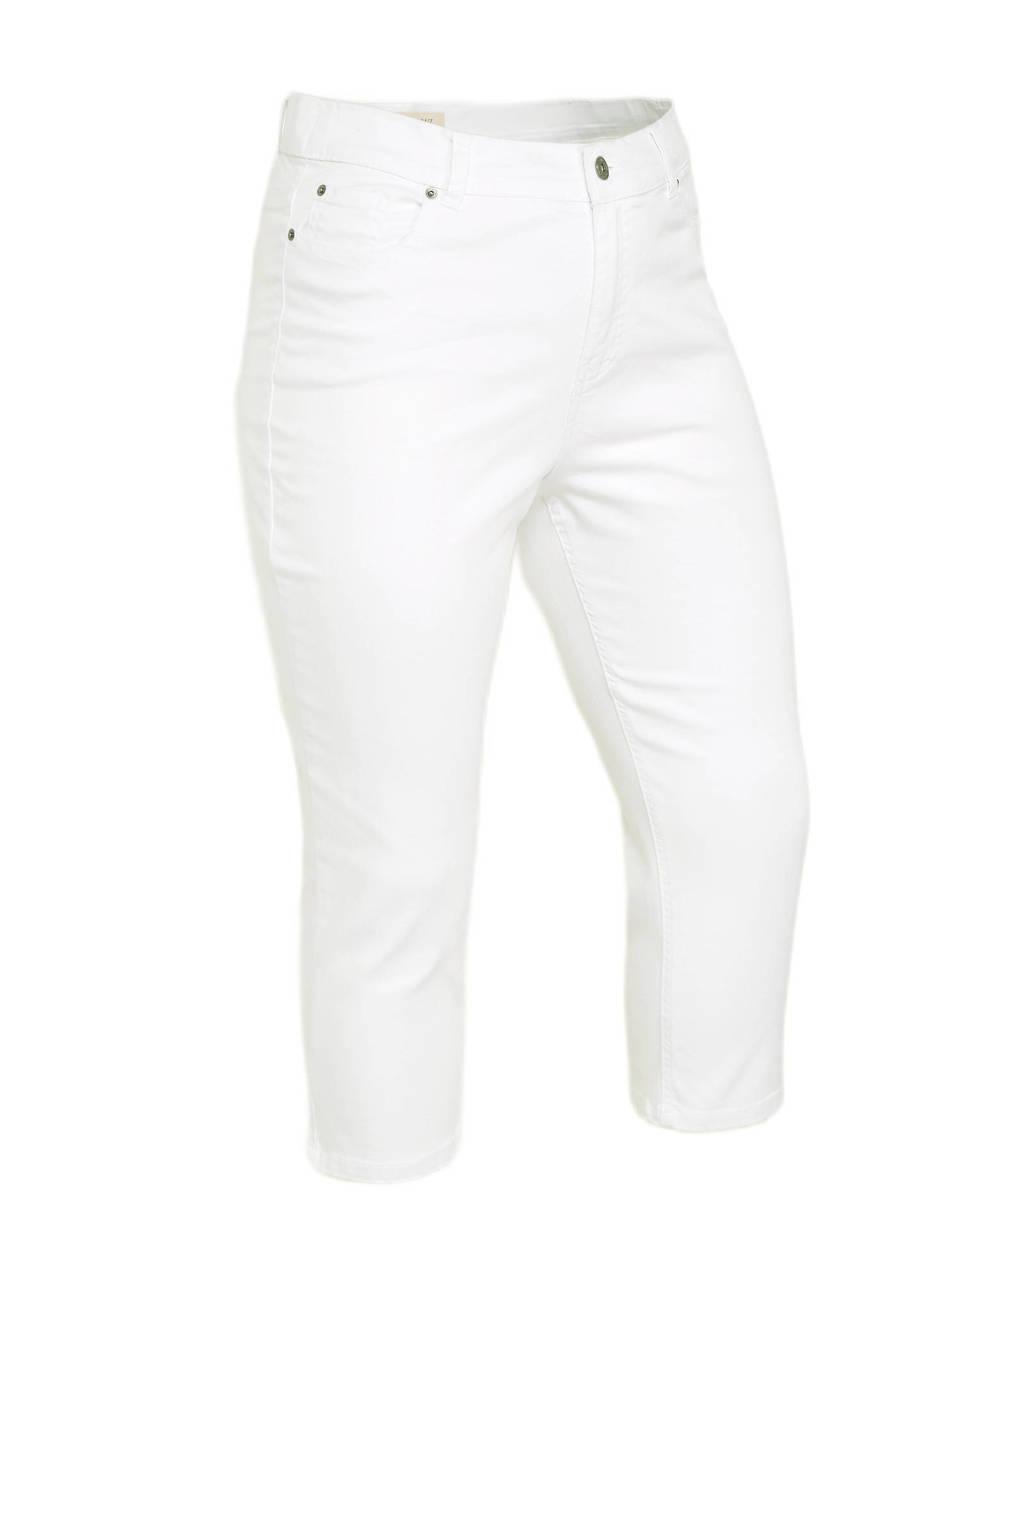 Simply Be high waist skinny capri jeans 24/7 wit, Wit